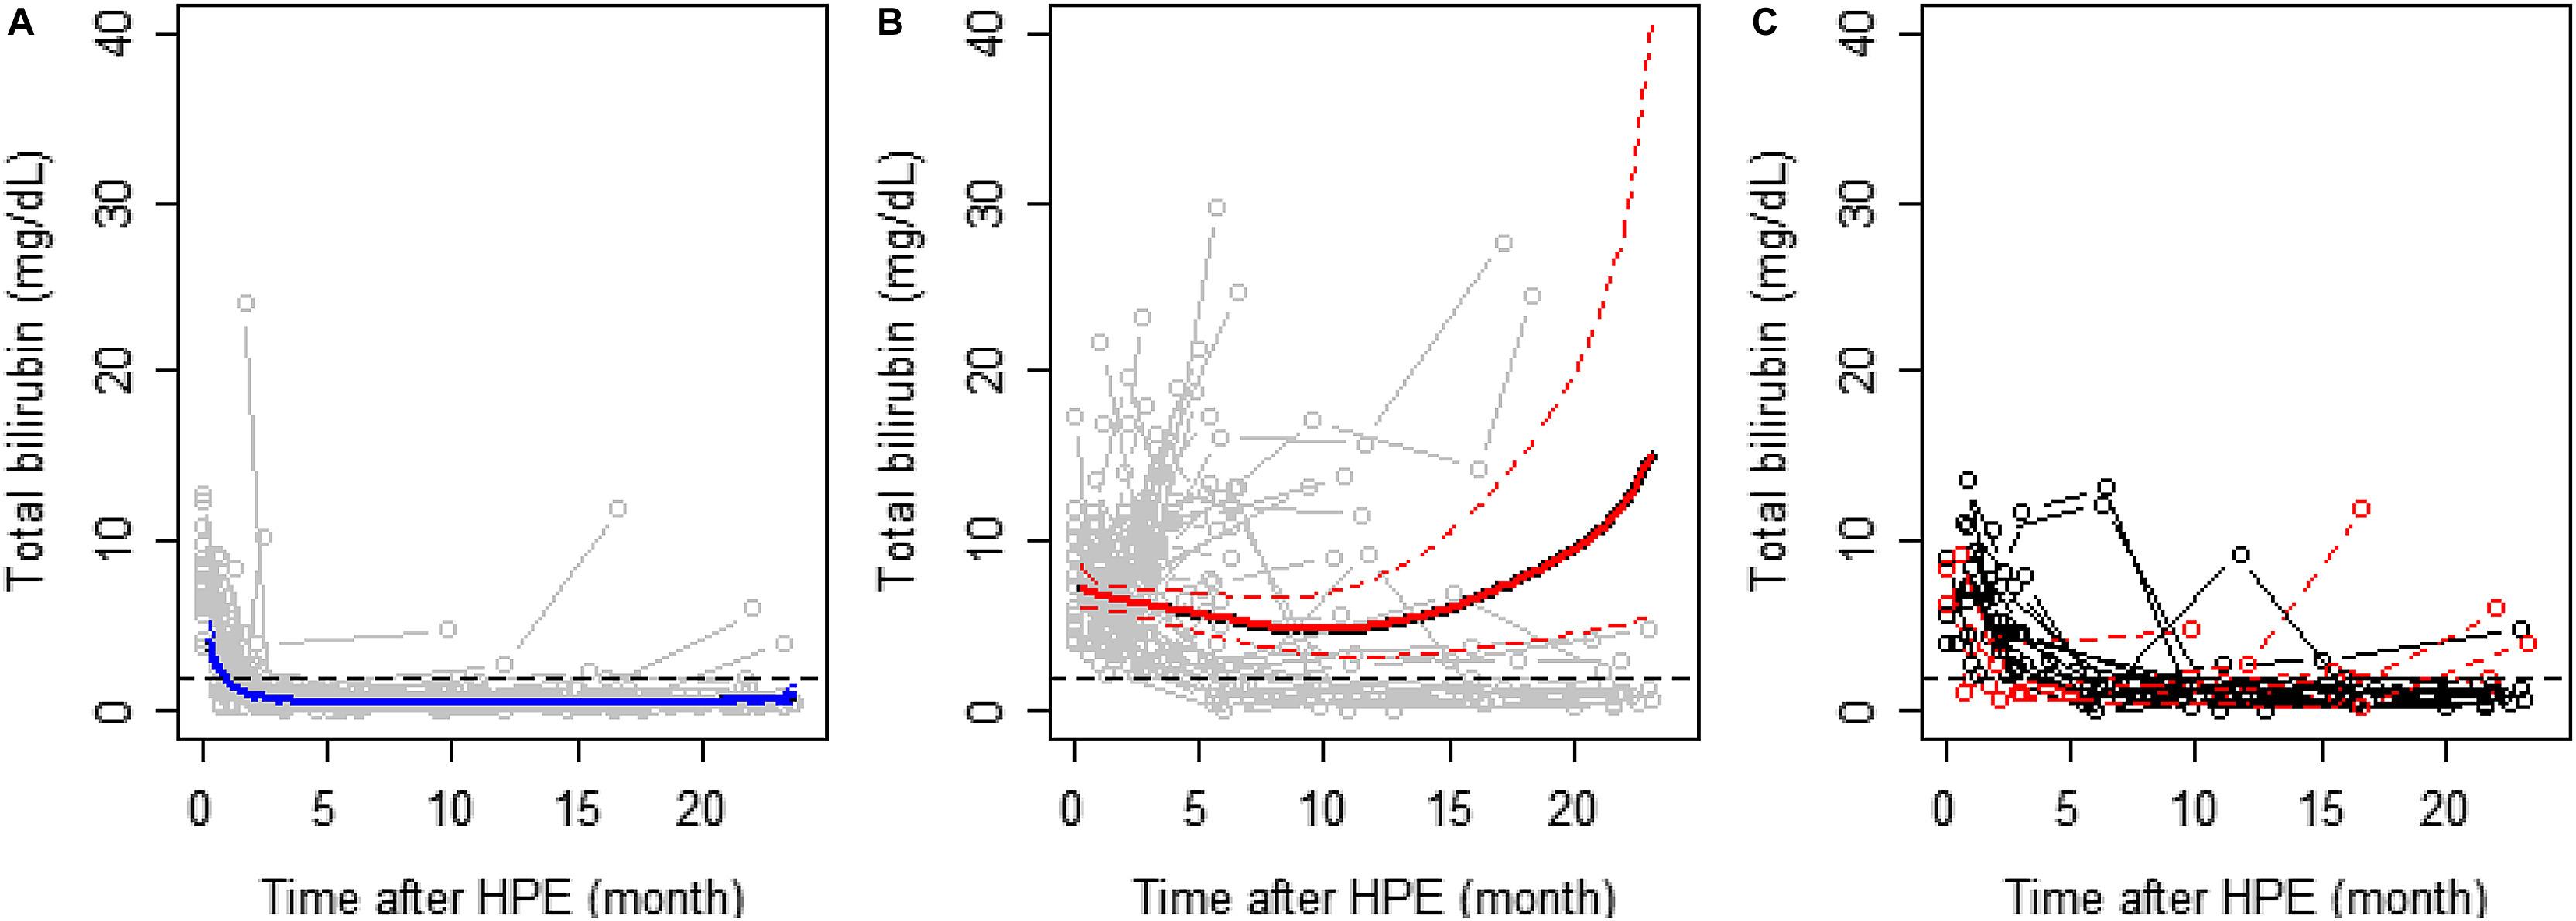 Total Serum Bilirubin Within 3 Months Of